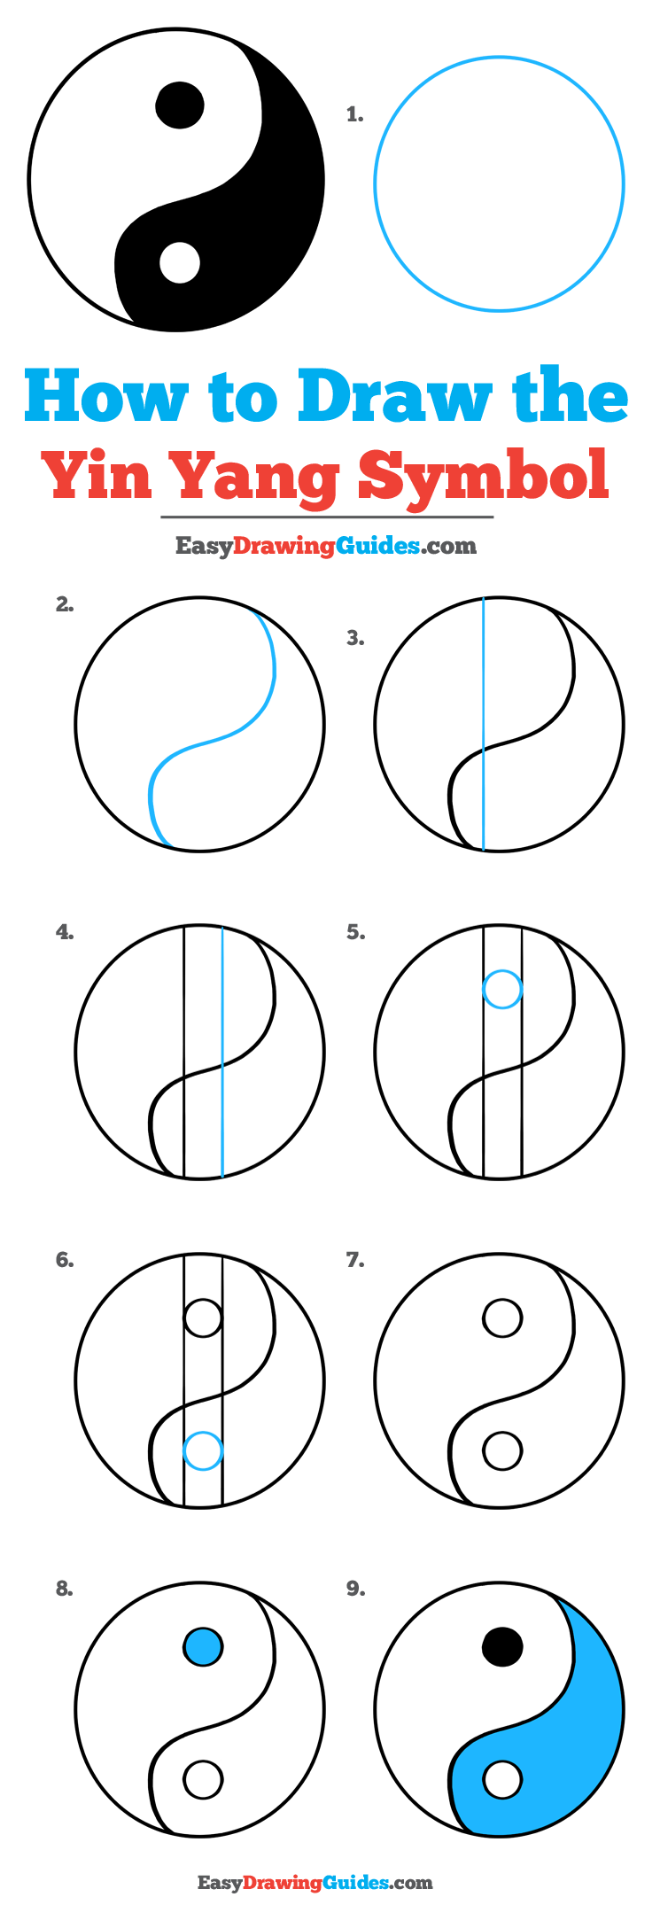 How To Draw The Yin Yang Symbol Really Easy Drawing Tutorial Drawing Tutorial Easy Drawing Tutorial Yin Yang